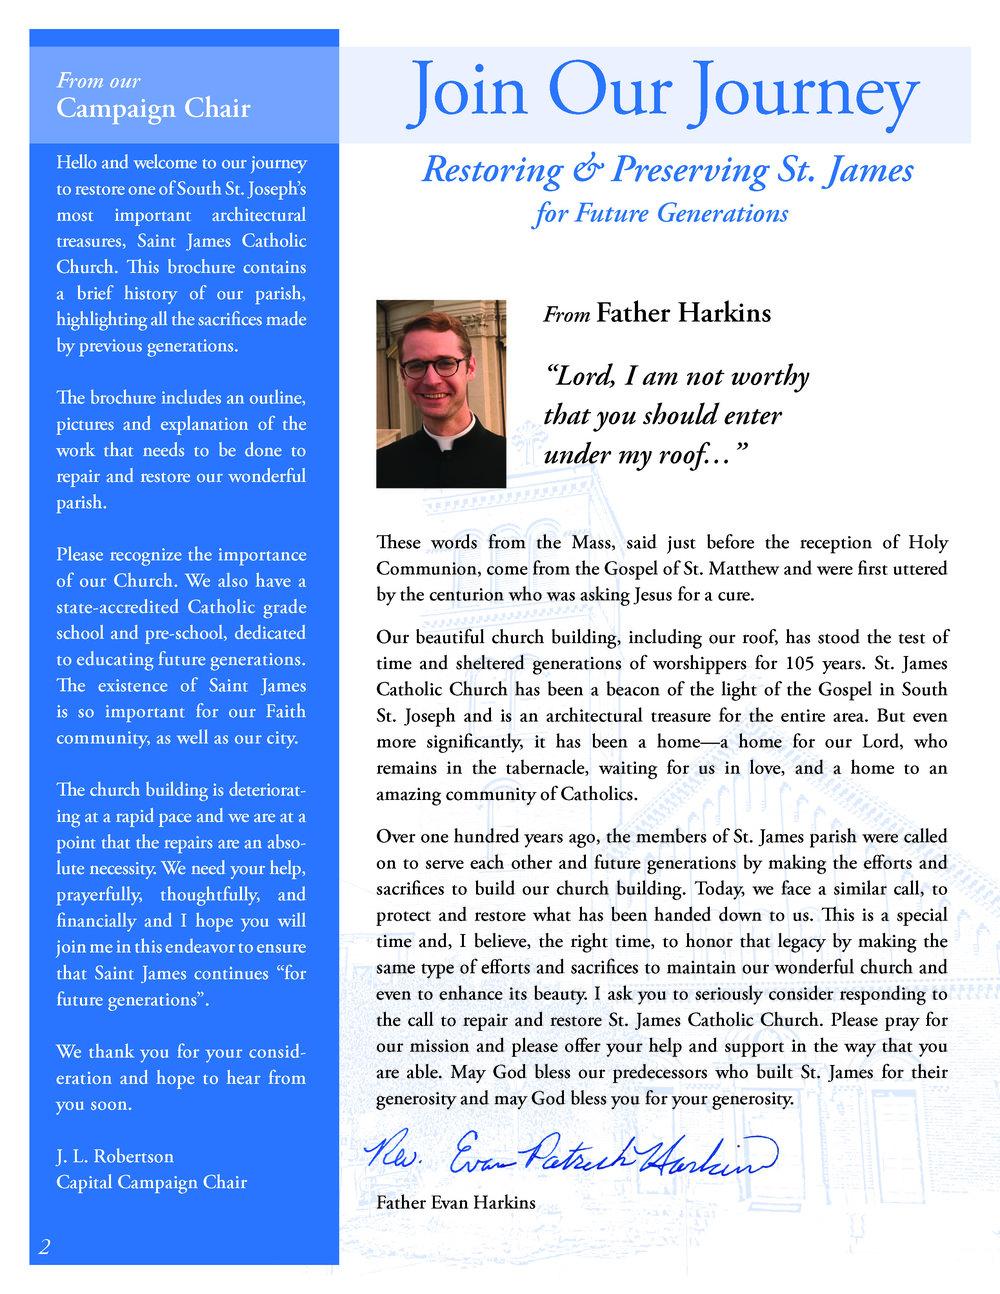 St. James Brochure R32_Page_2.jpg